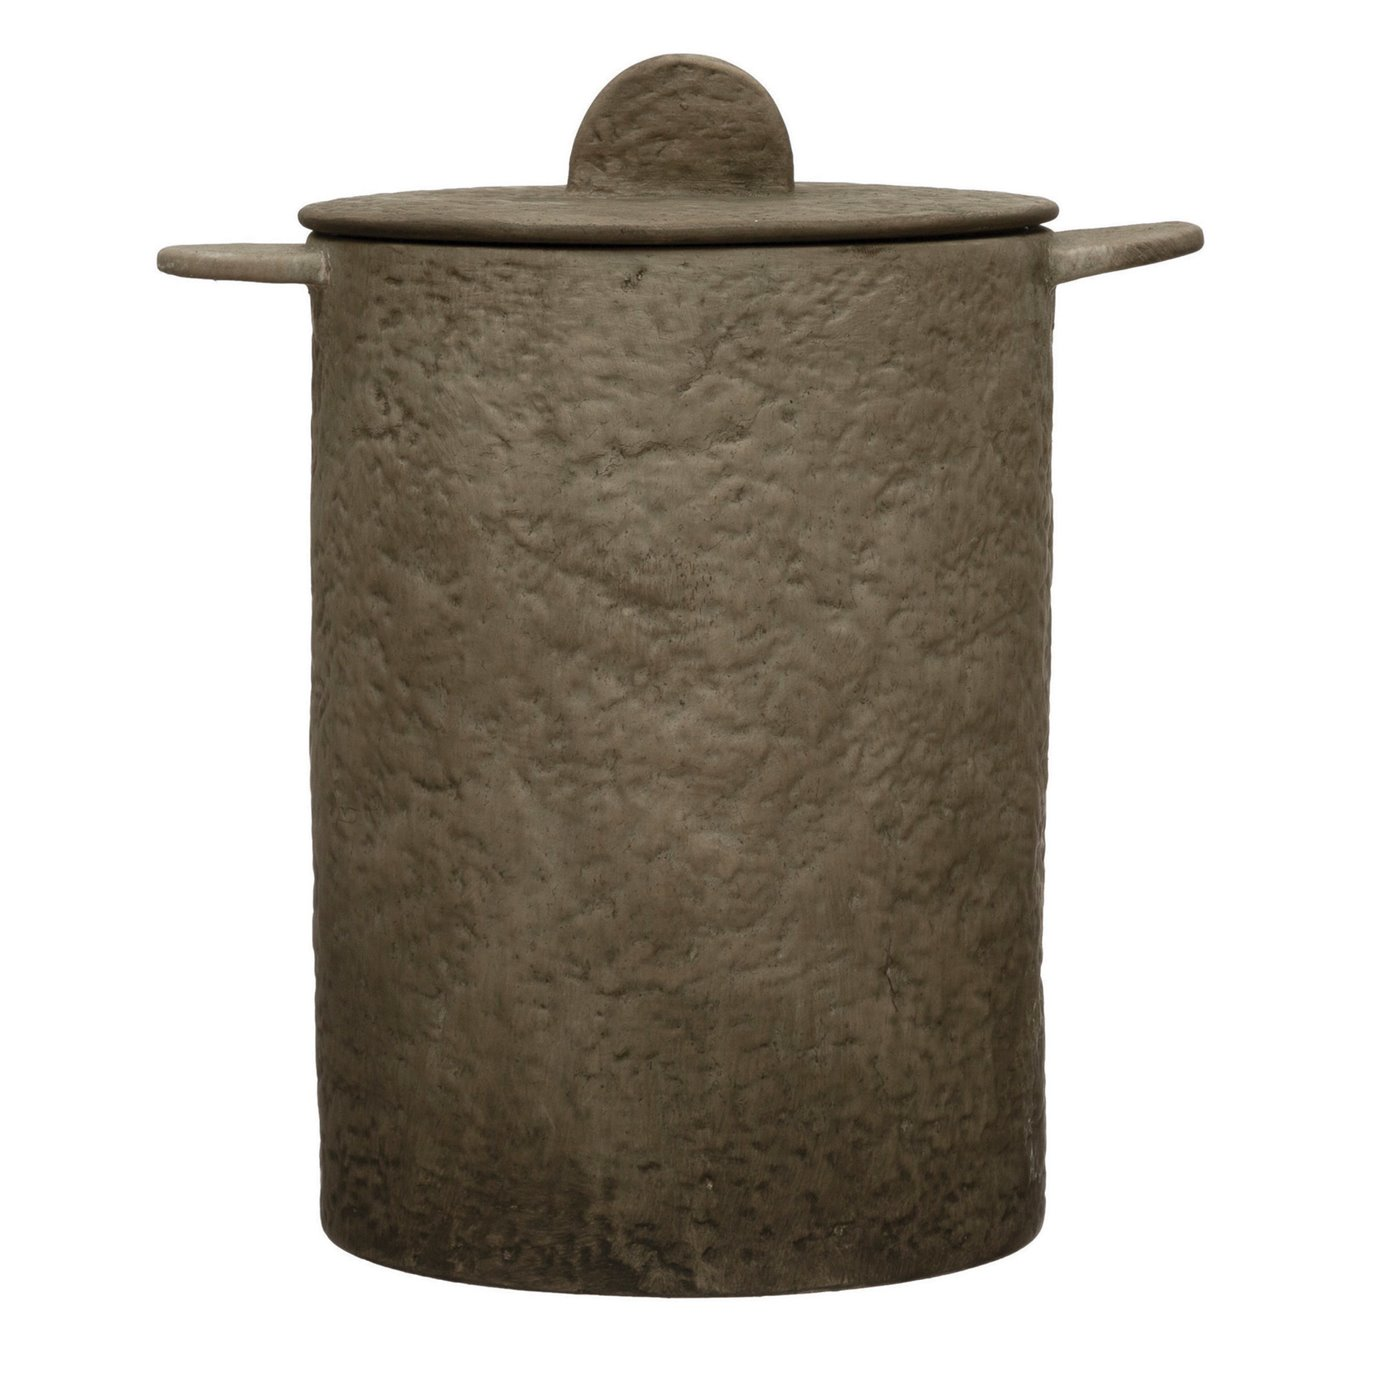 Textured Terra-cotta Jar with Lid, Matte Beige